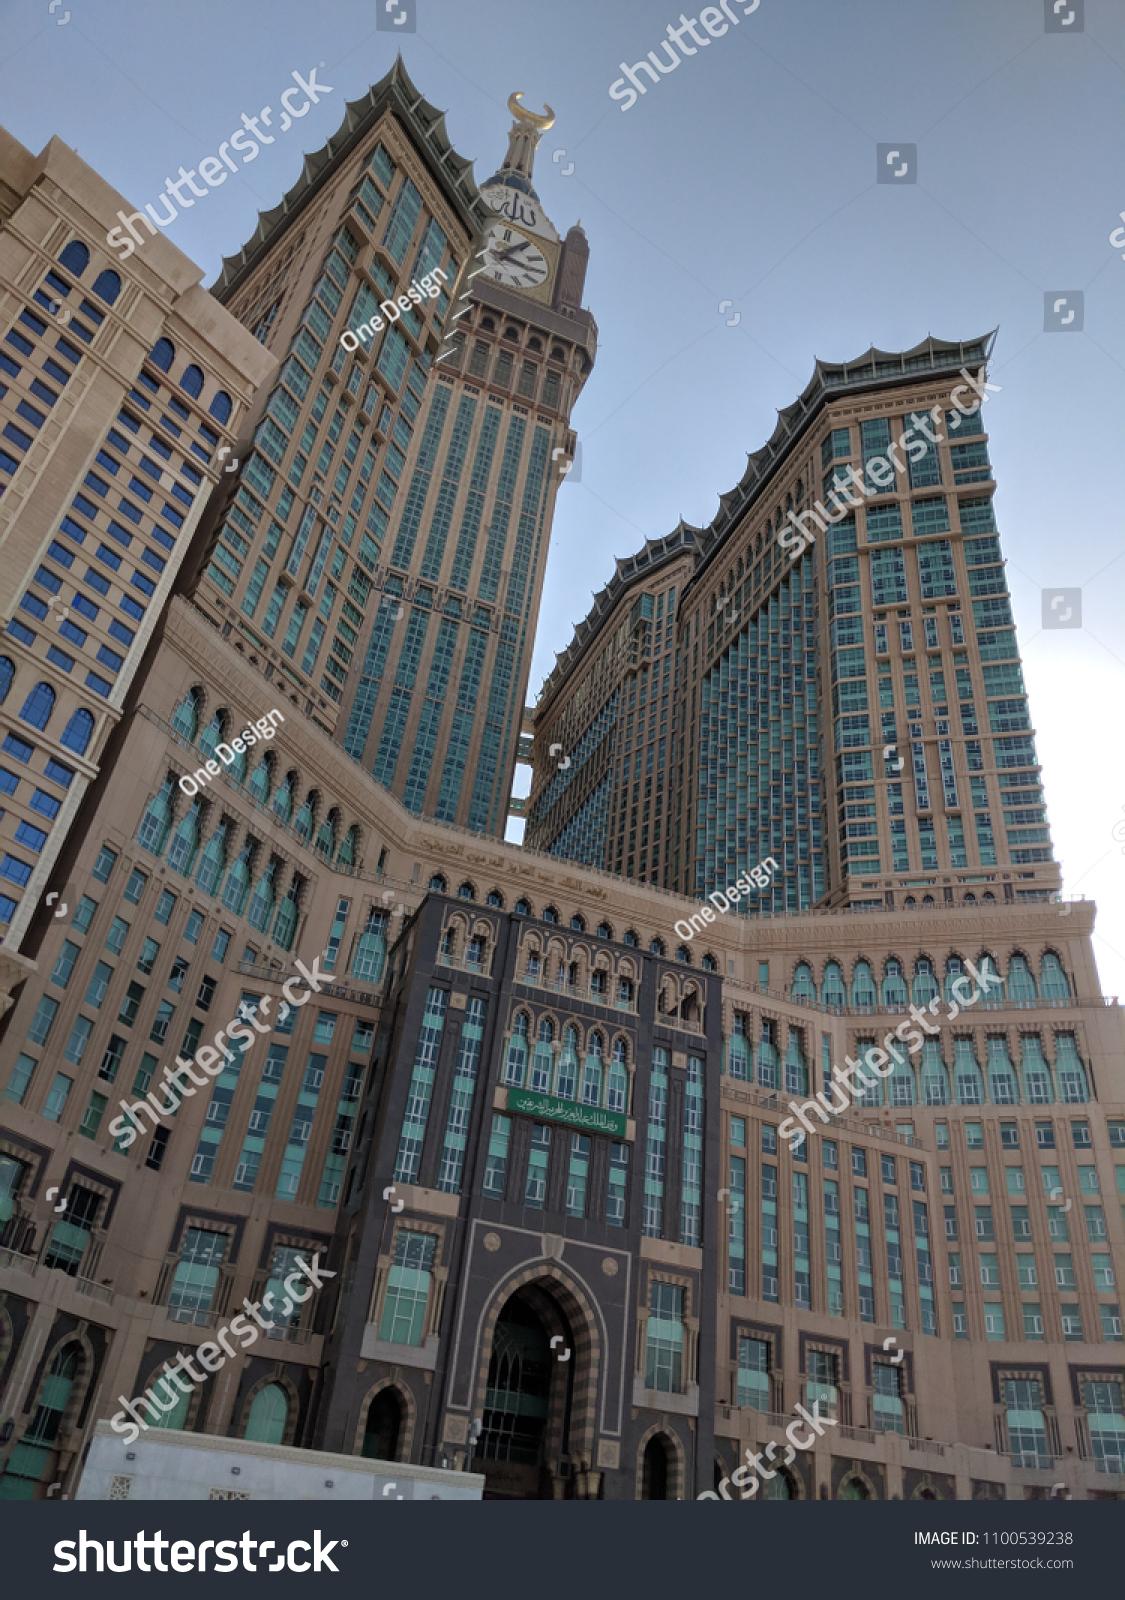 Kaaba Makkah View Royal Clock Tower Stock Photo Edit Now 1100539238